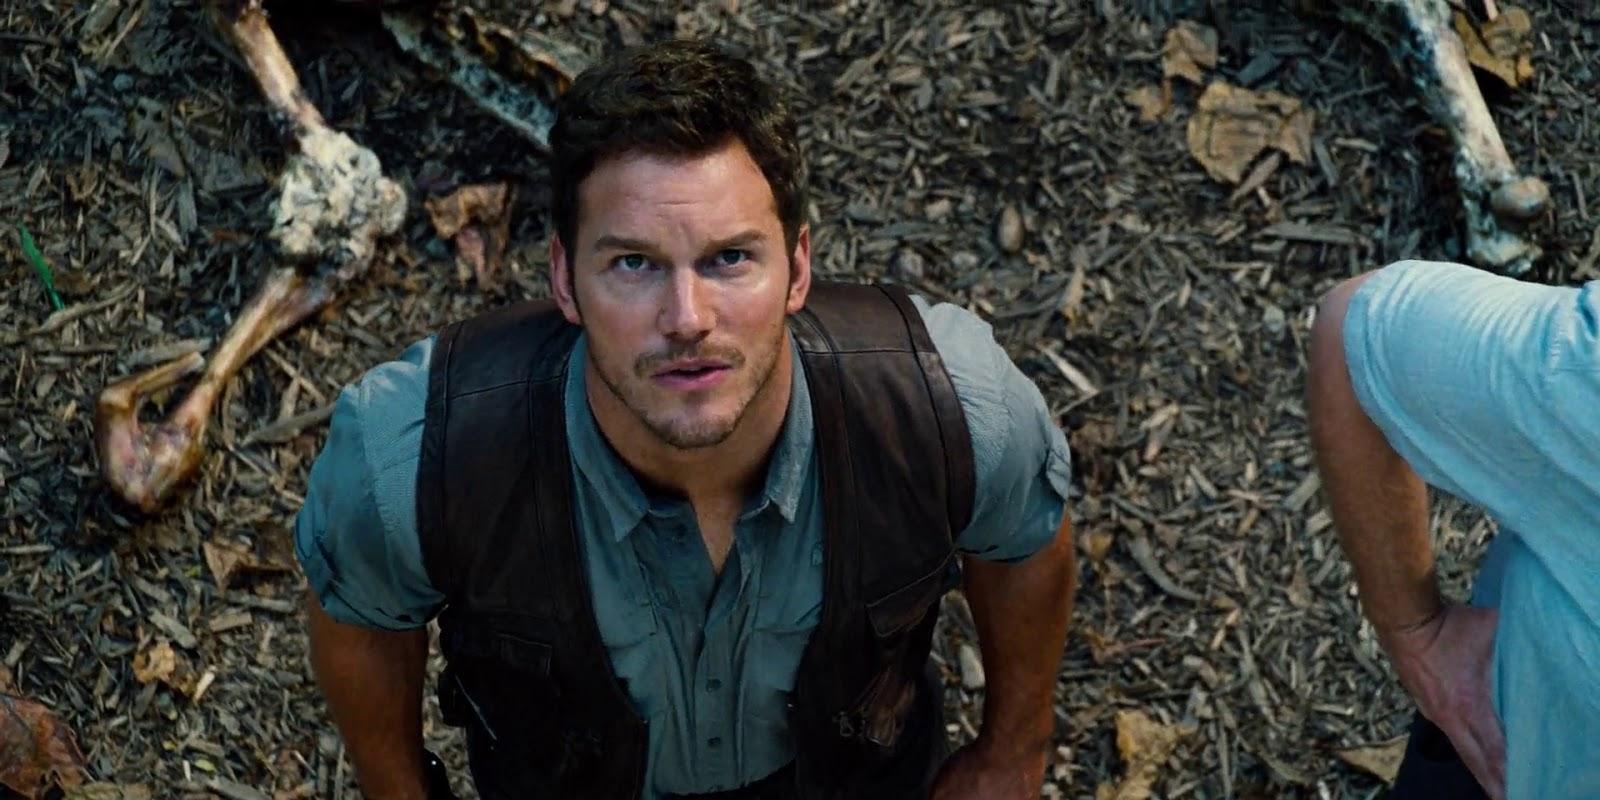 Jurassic World (2015) 3